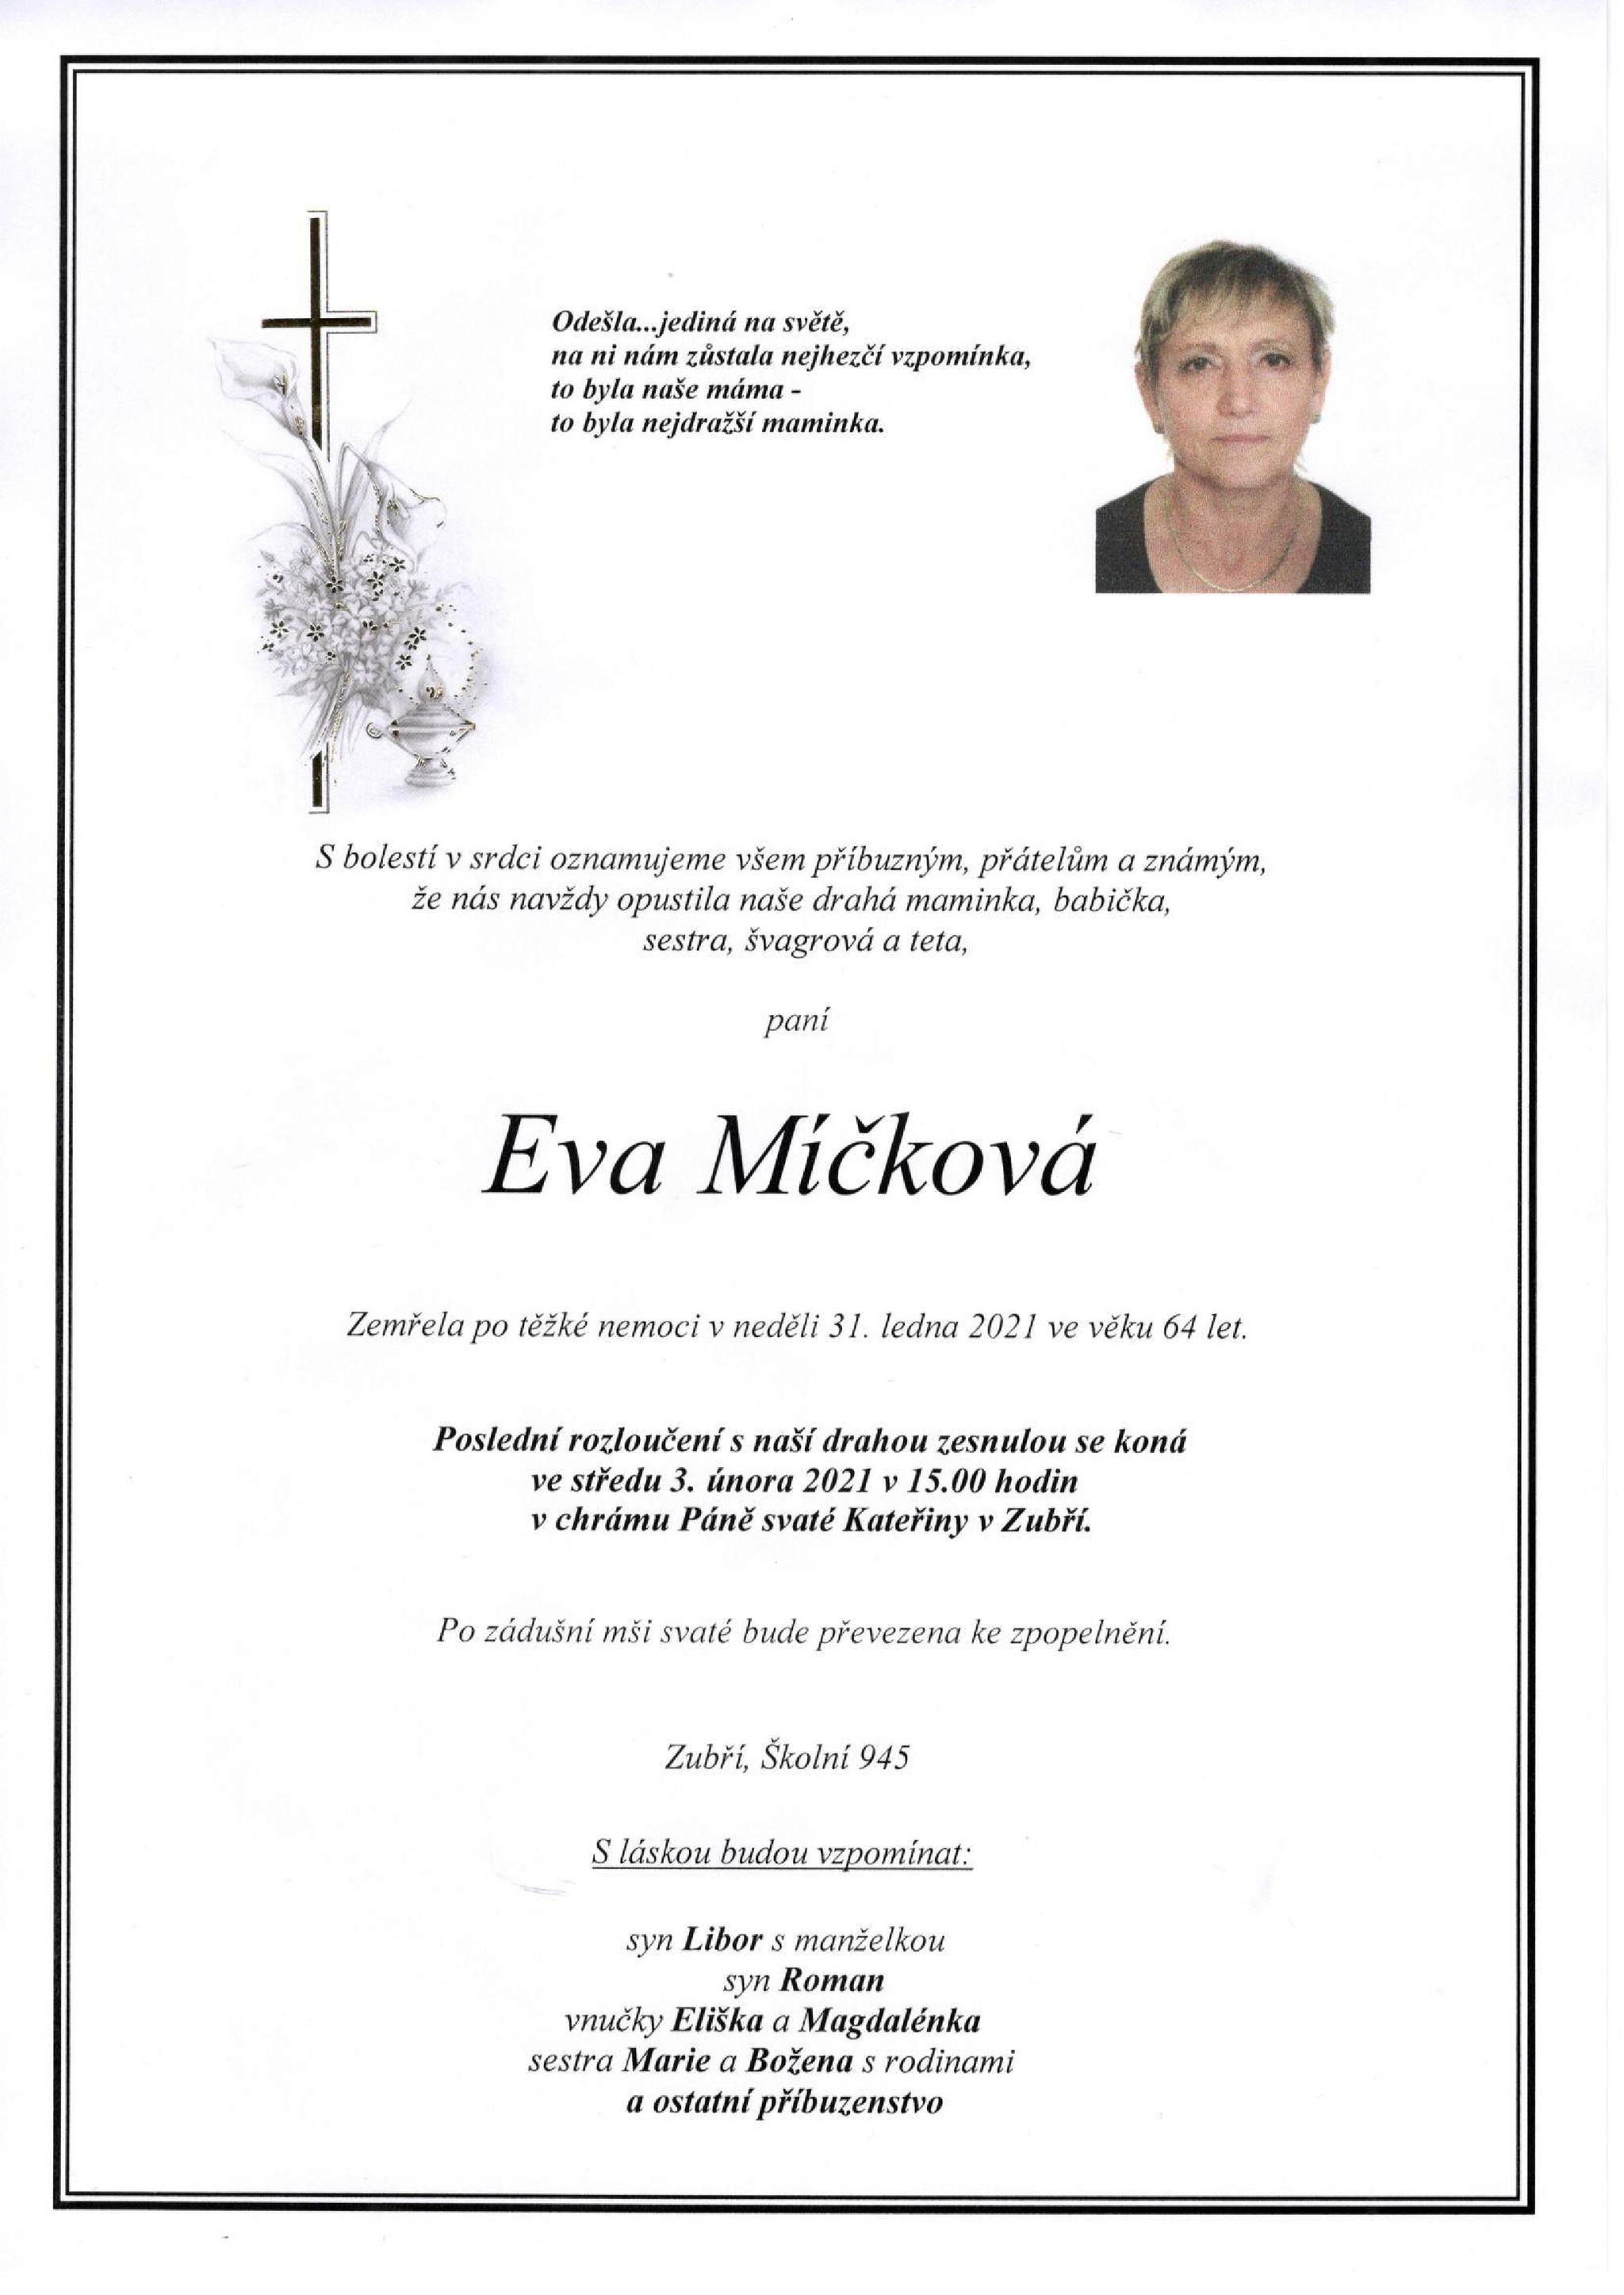 Eva Míčková